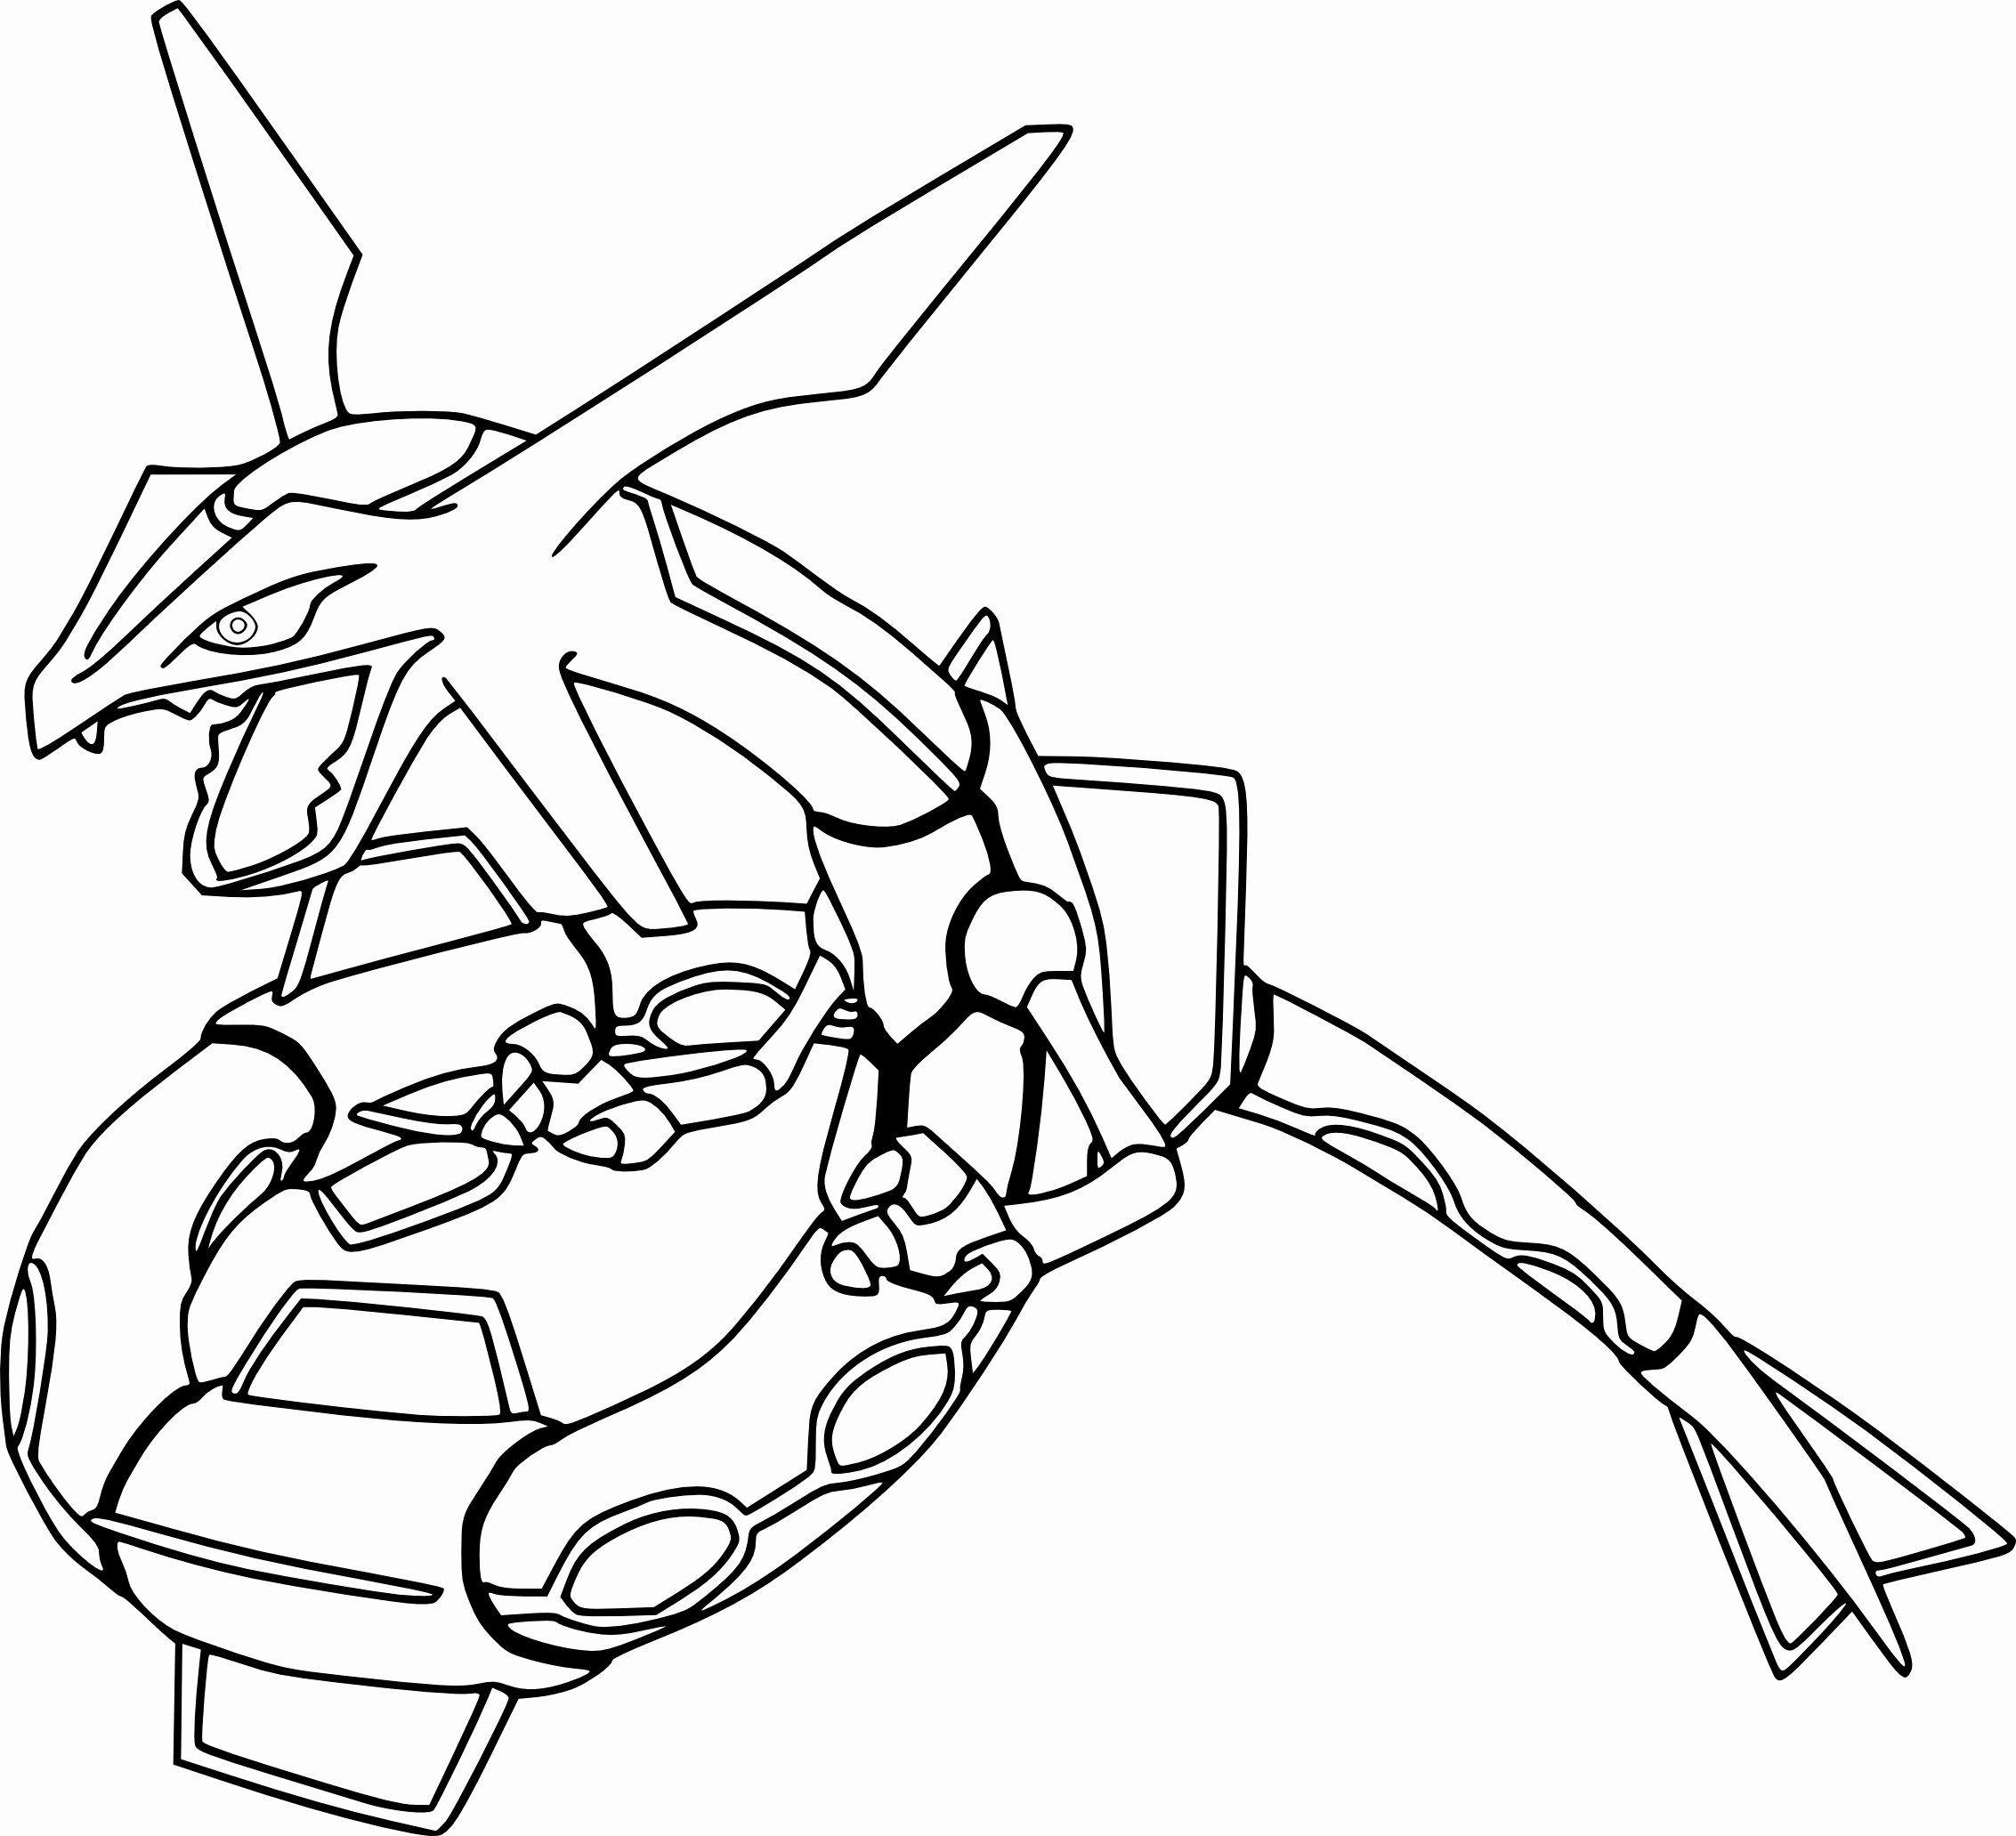 Coloriage Pokemon Groudon Kyogre Rayquaza Artemia Org – Cute32